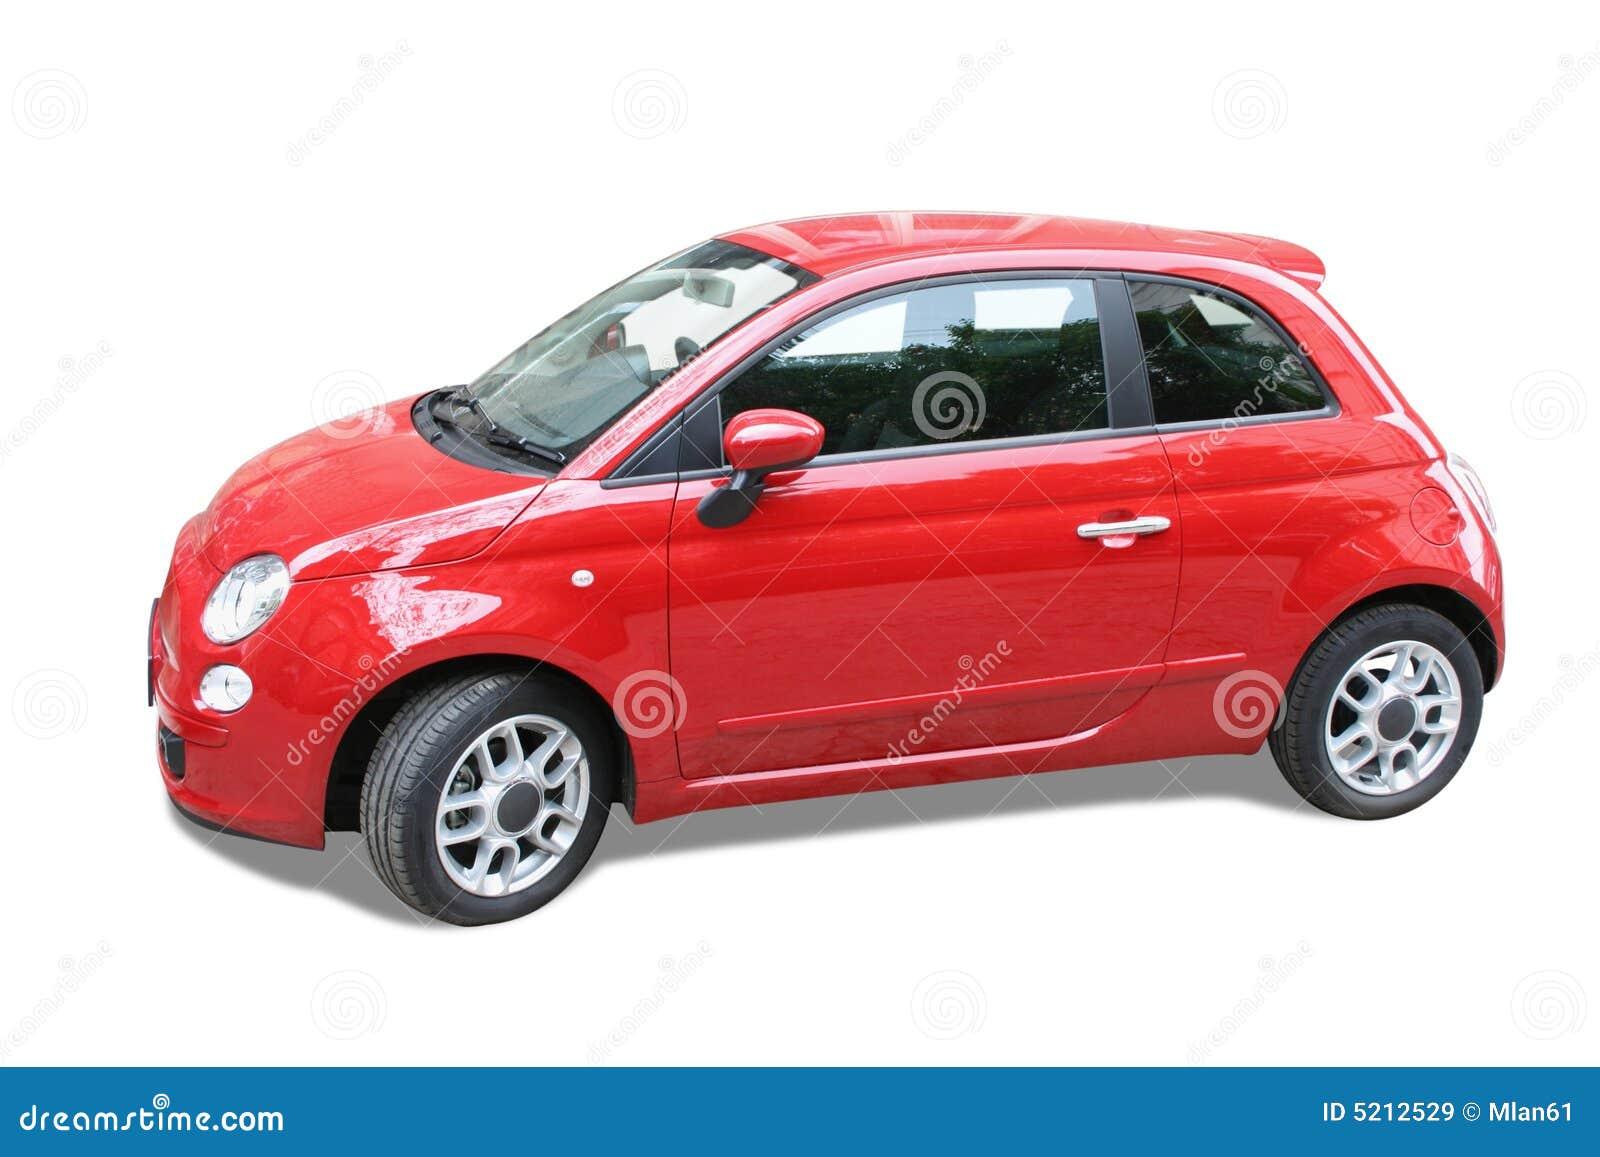 kleines rotes auto stockbild bild von transport auto 5212529. Black Bedroom Furniture Sets. Home Design Ideas